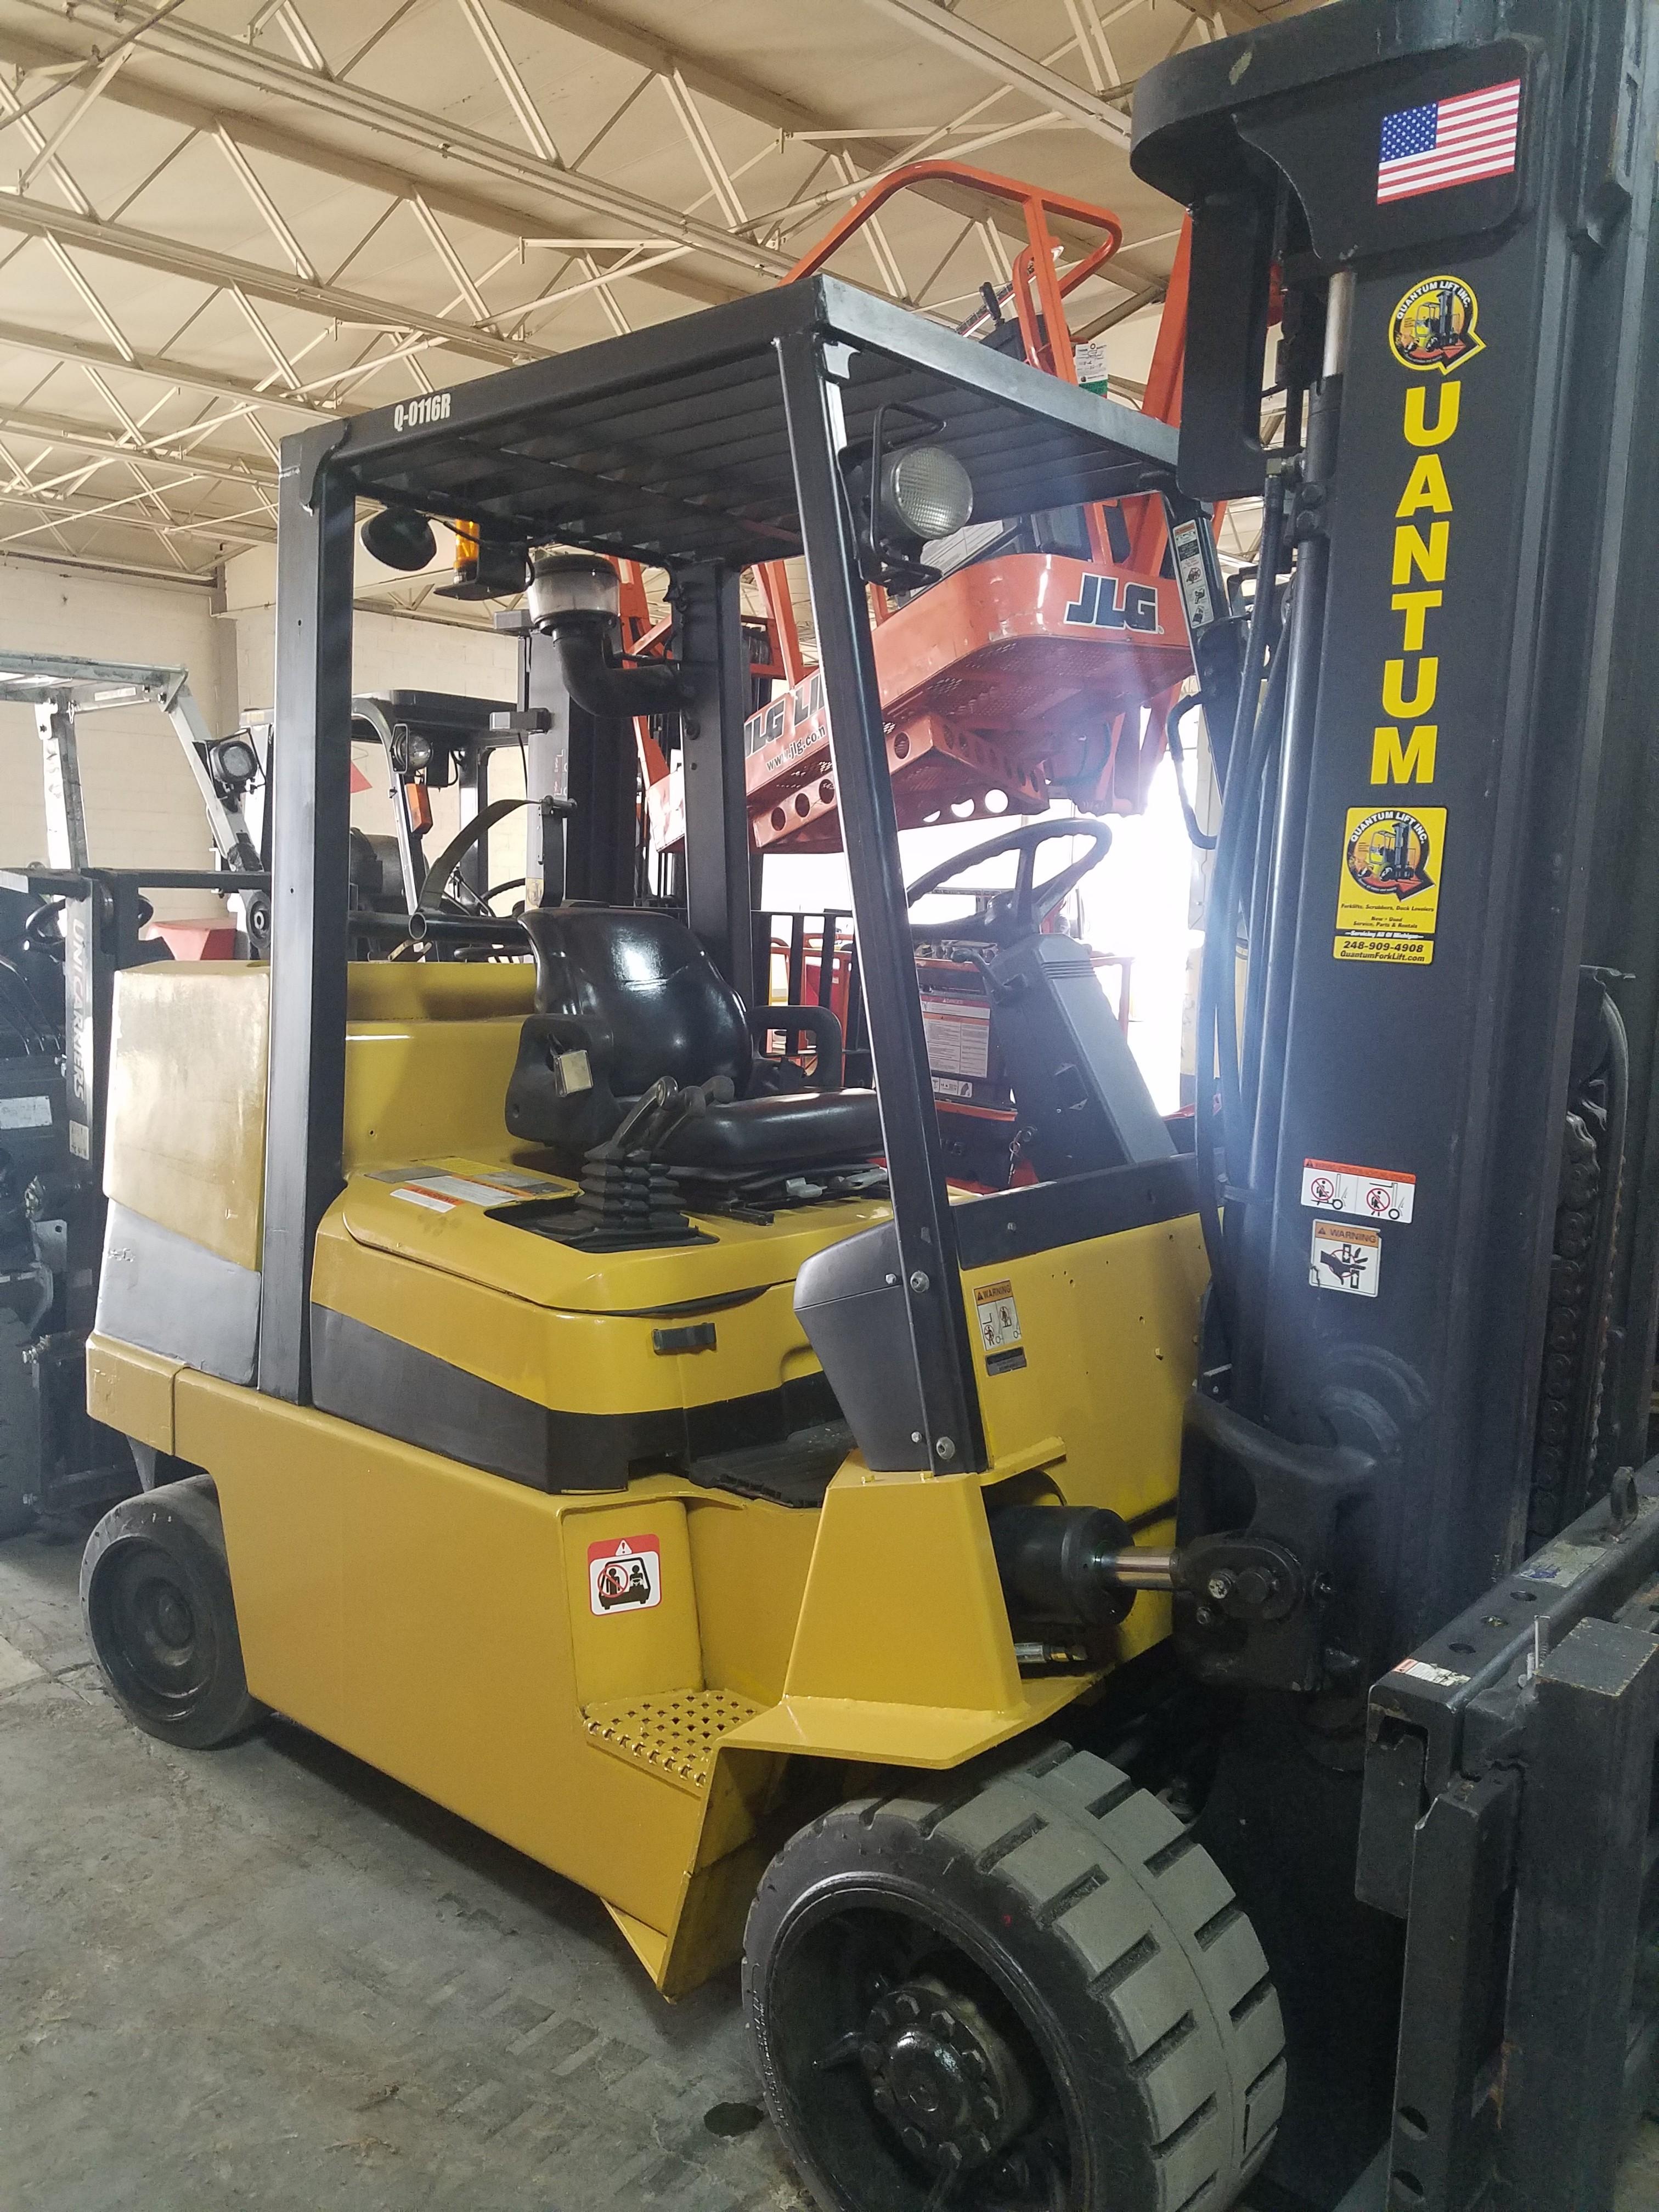 Used, Other, GLC120MJNGAE092, Forklifts / Lift Trucks